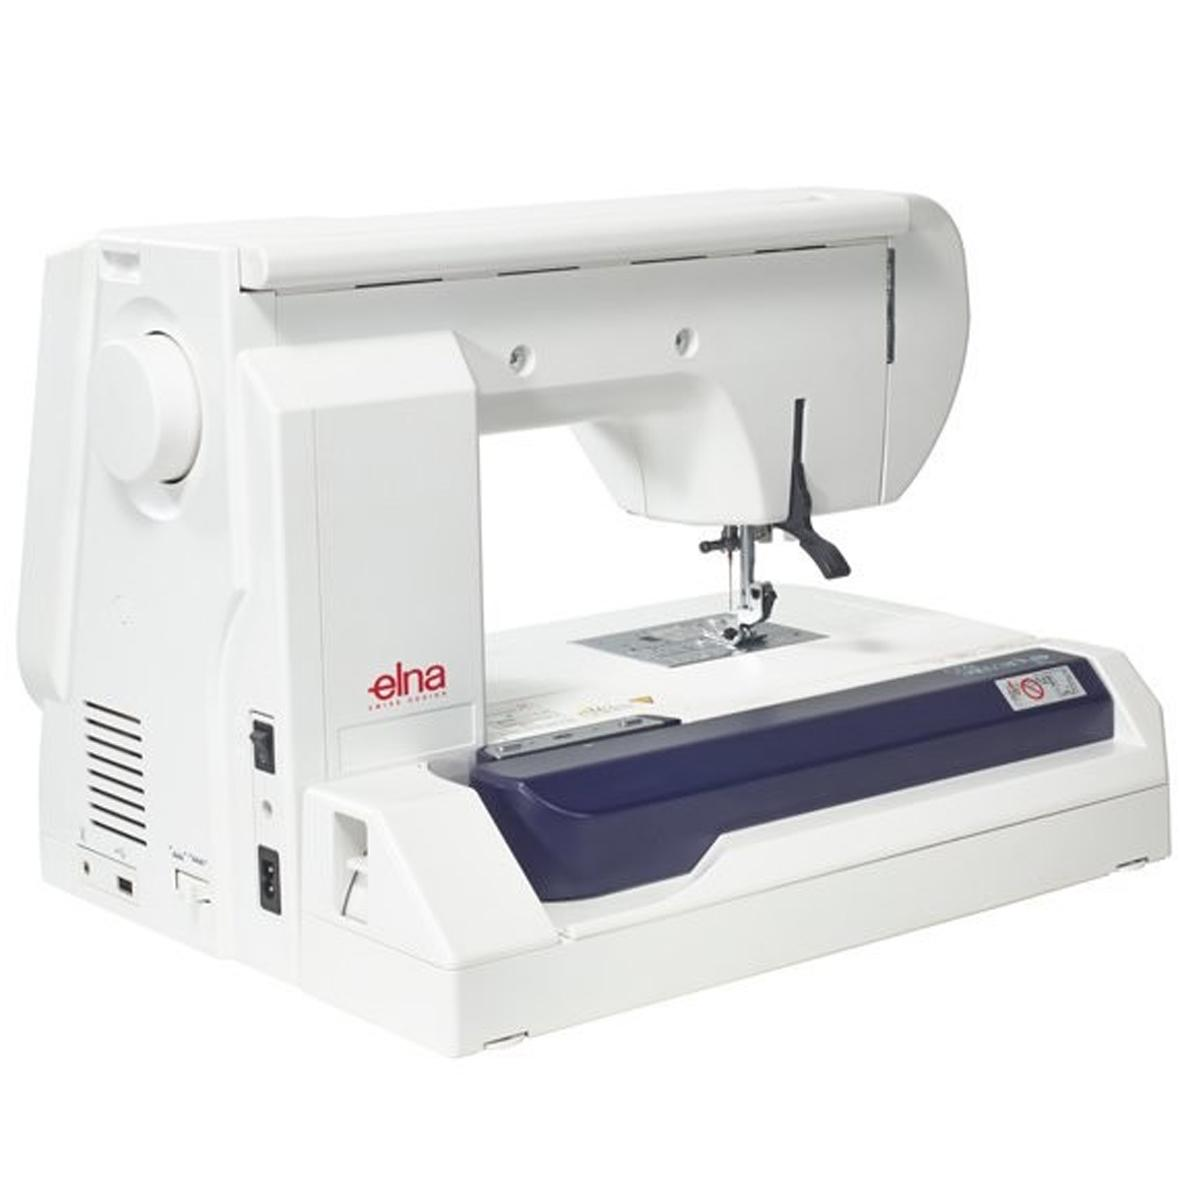 Elna eXpressive 860   Frank Nutt Sewing Machines Ltd   Buy ...